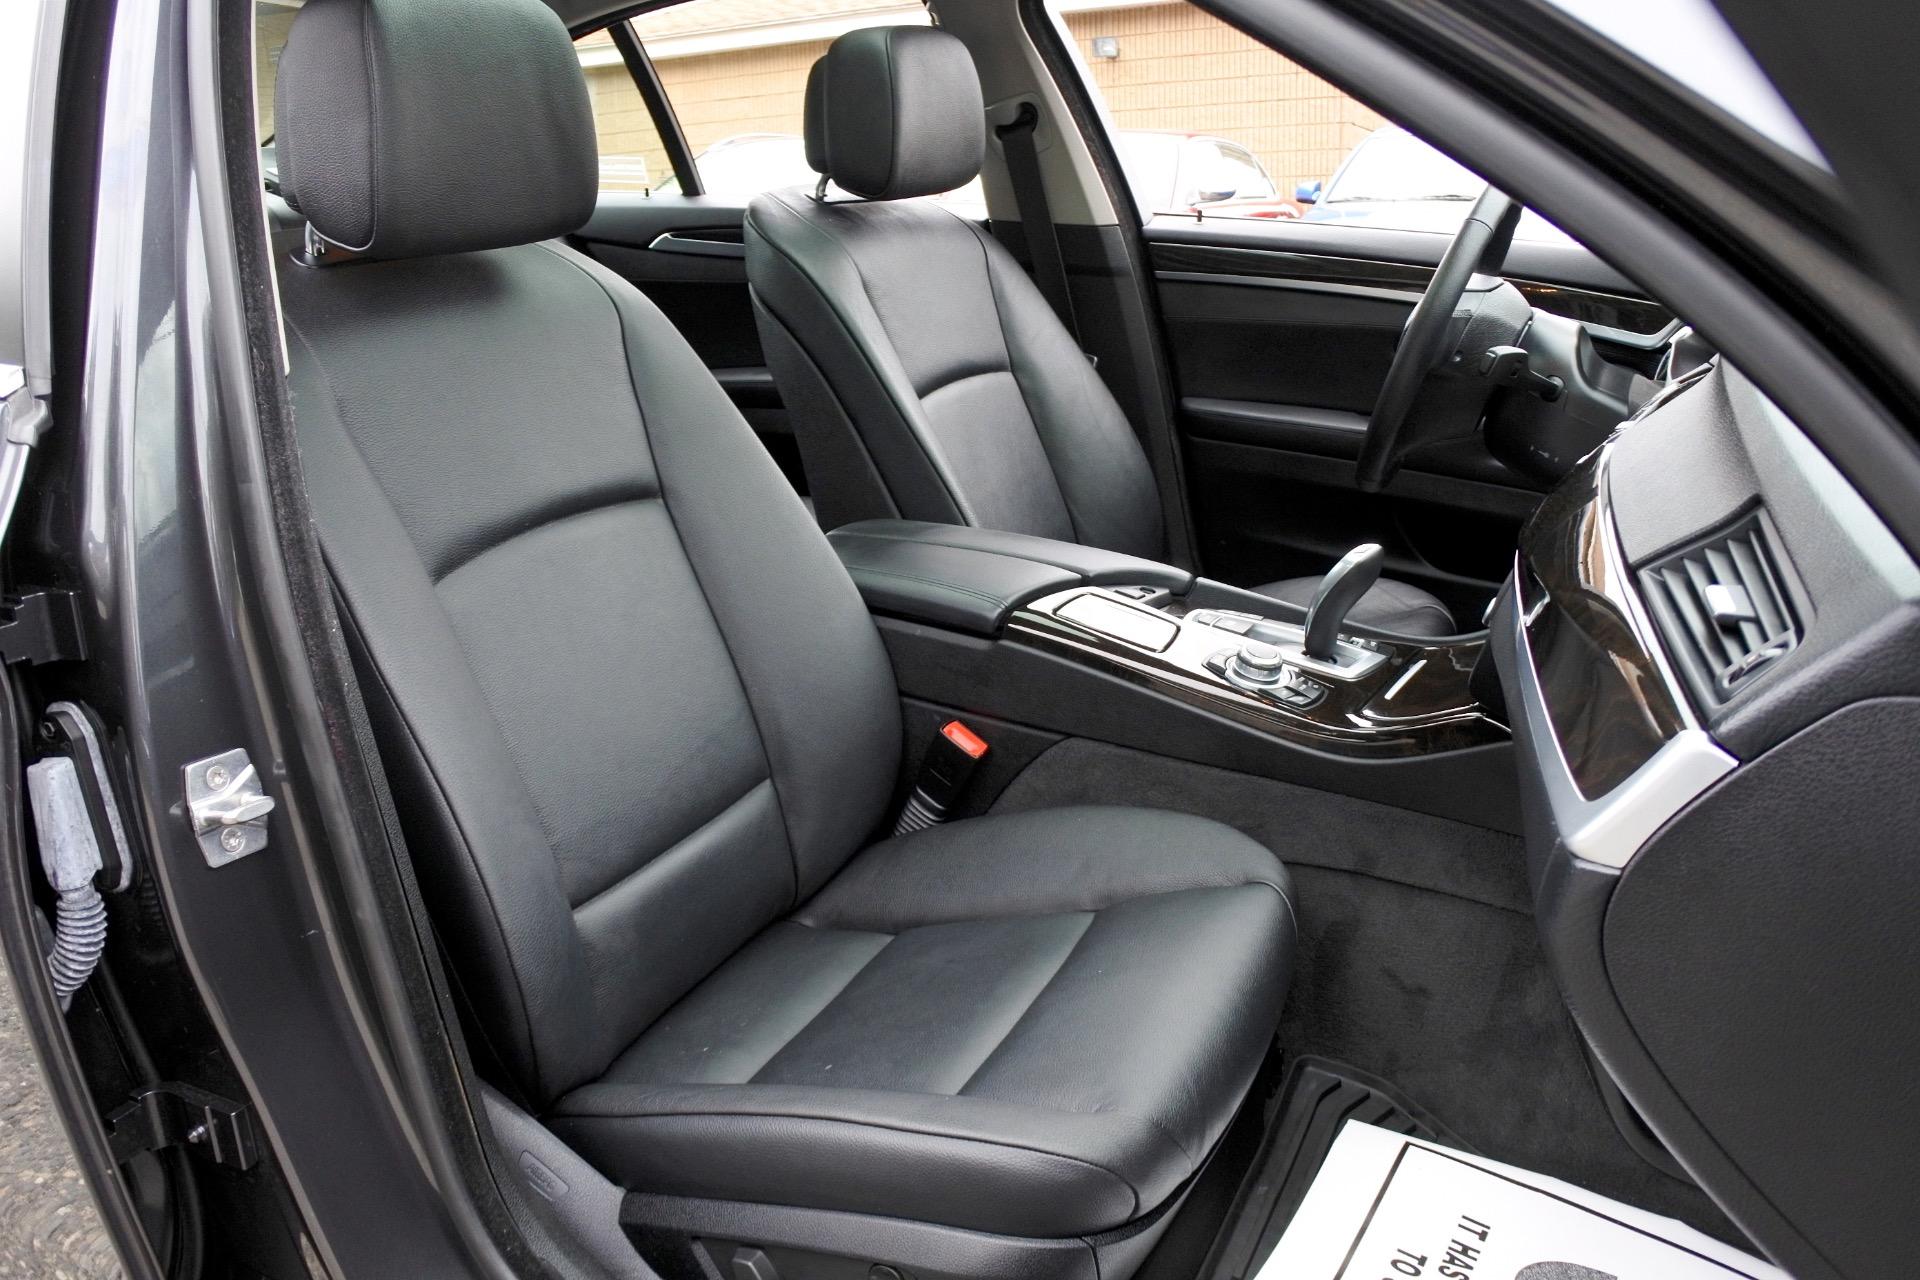 Used 2012 BMW 5 Series 528i xDrive AWD Used 2012 BMW 5 Series 528i xDrive AWD for sale  at Metro West Motorcars LLC in Shrewsbury MA 20